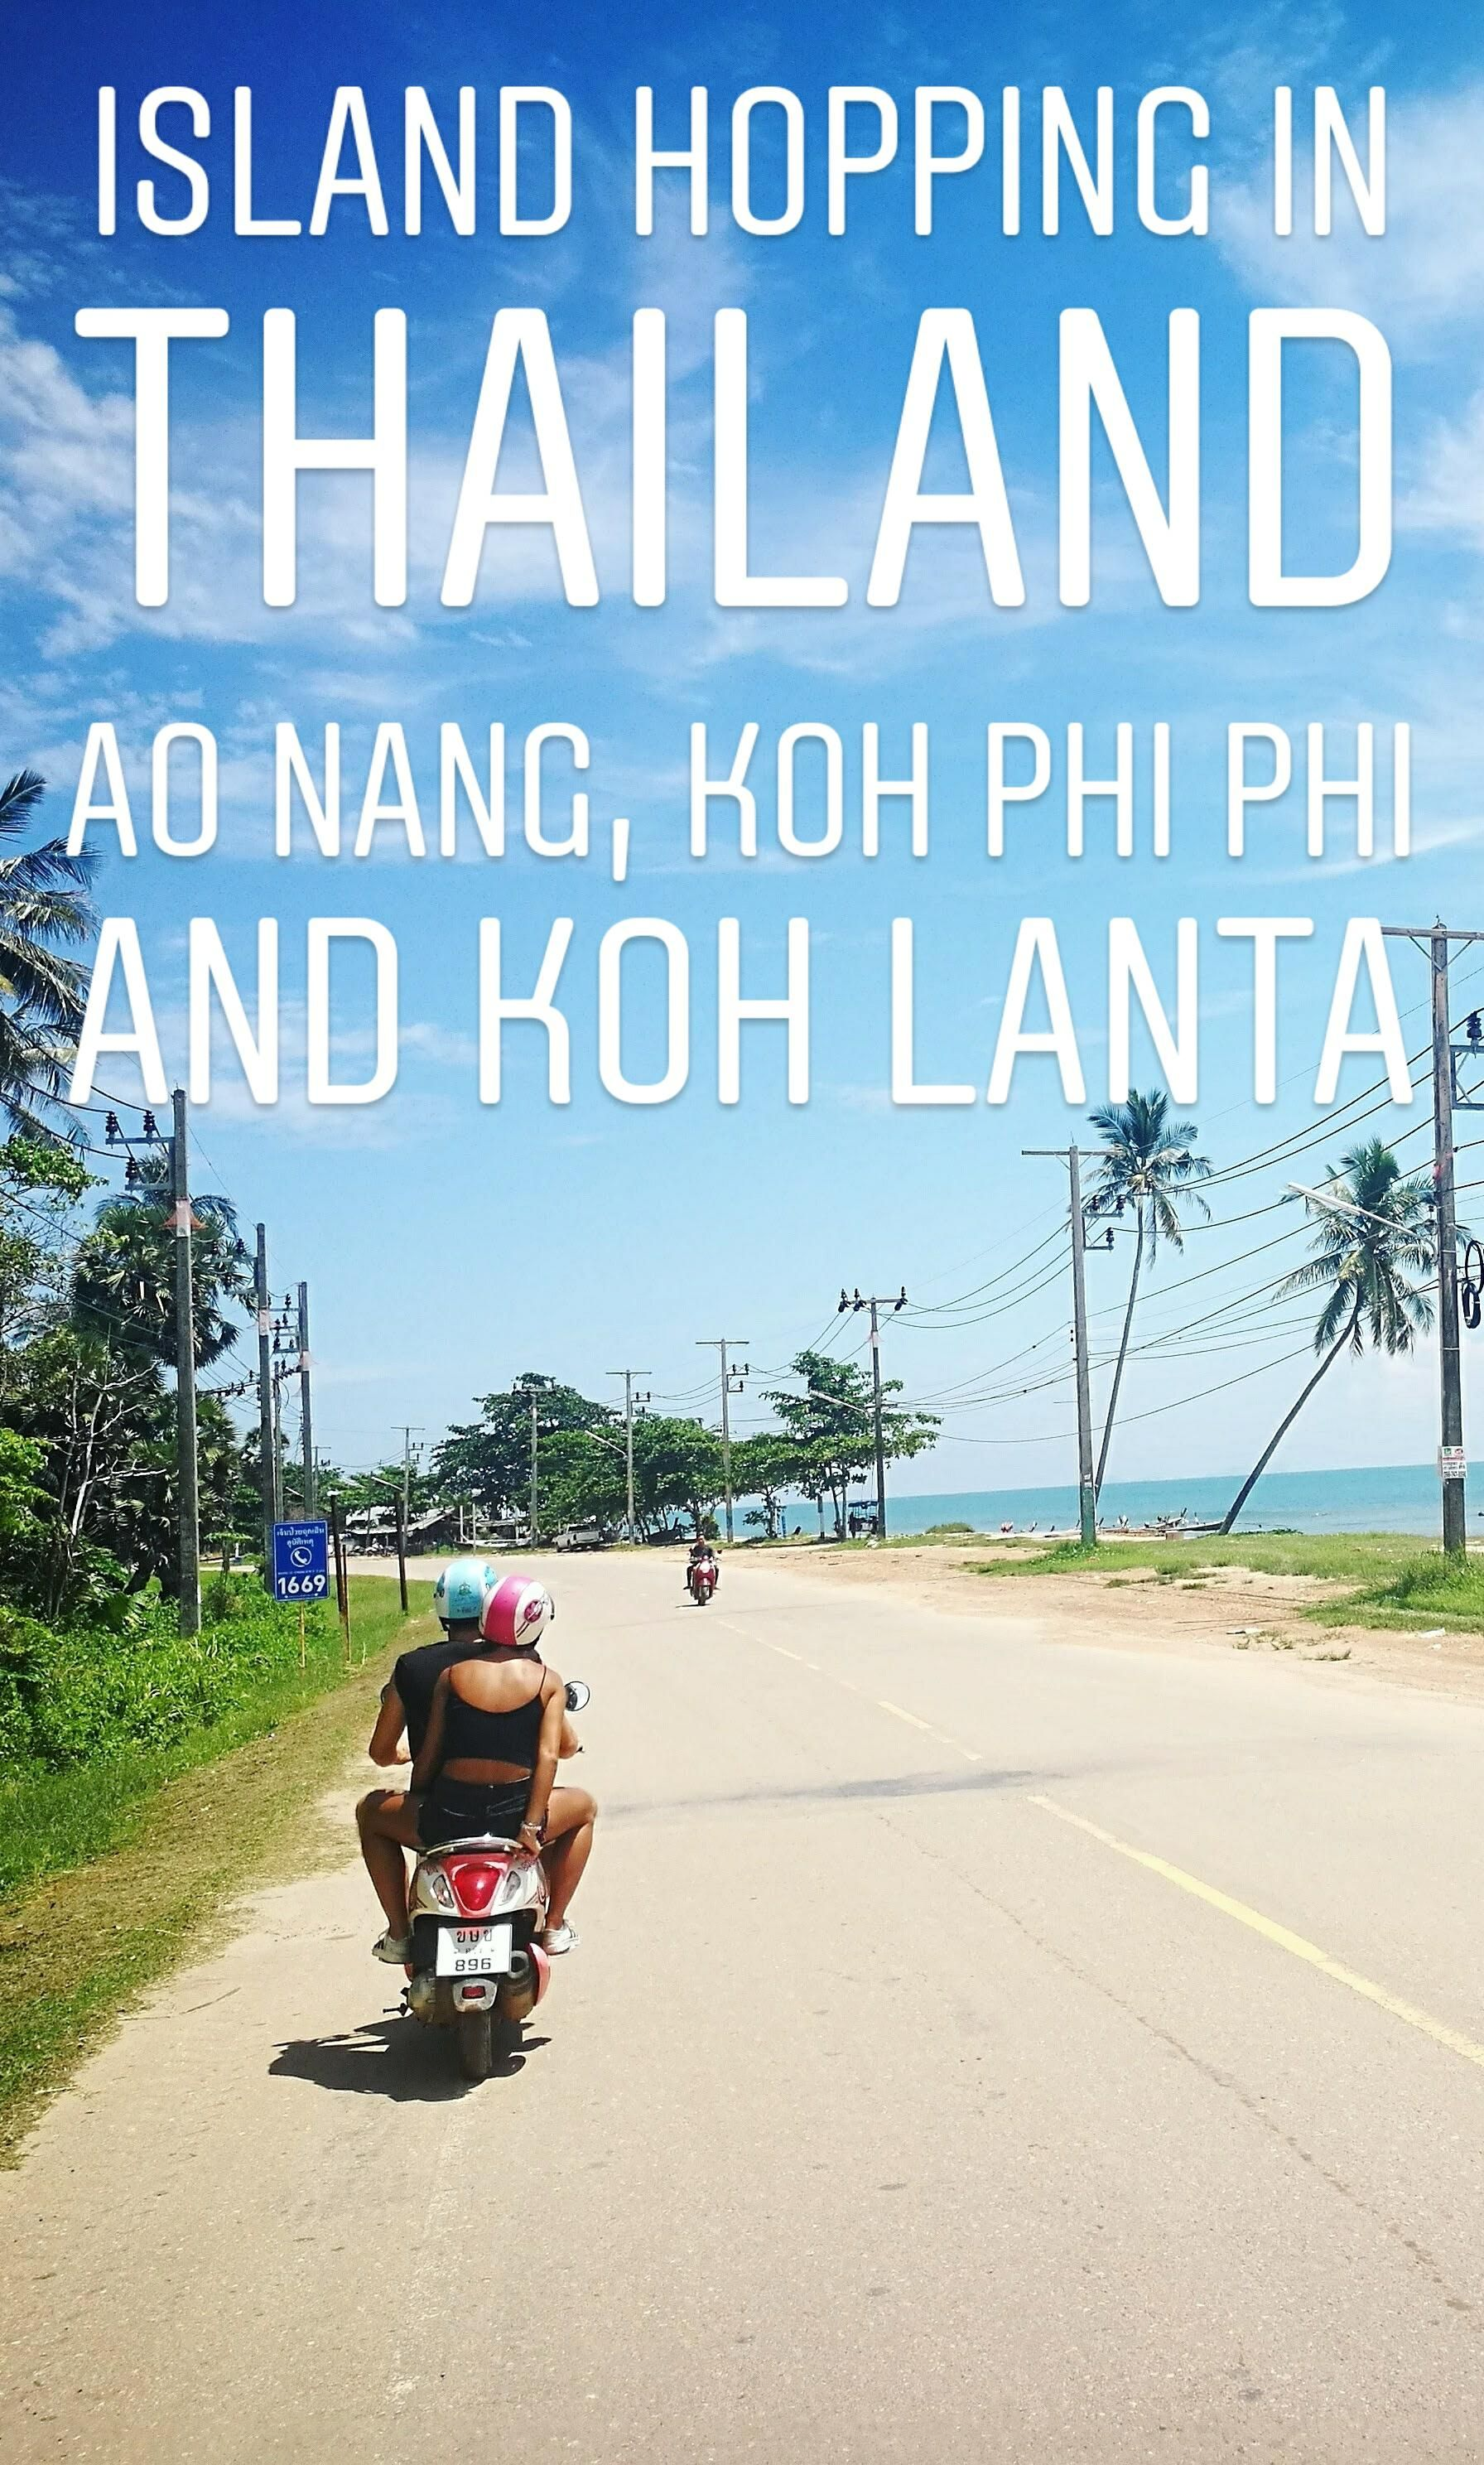 Island Hopping in Thailand Ao Nang, Koh Phi Phi & Koh Lanta